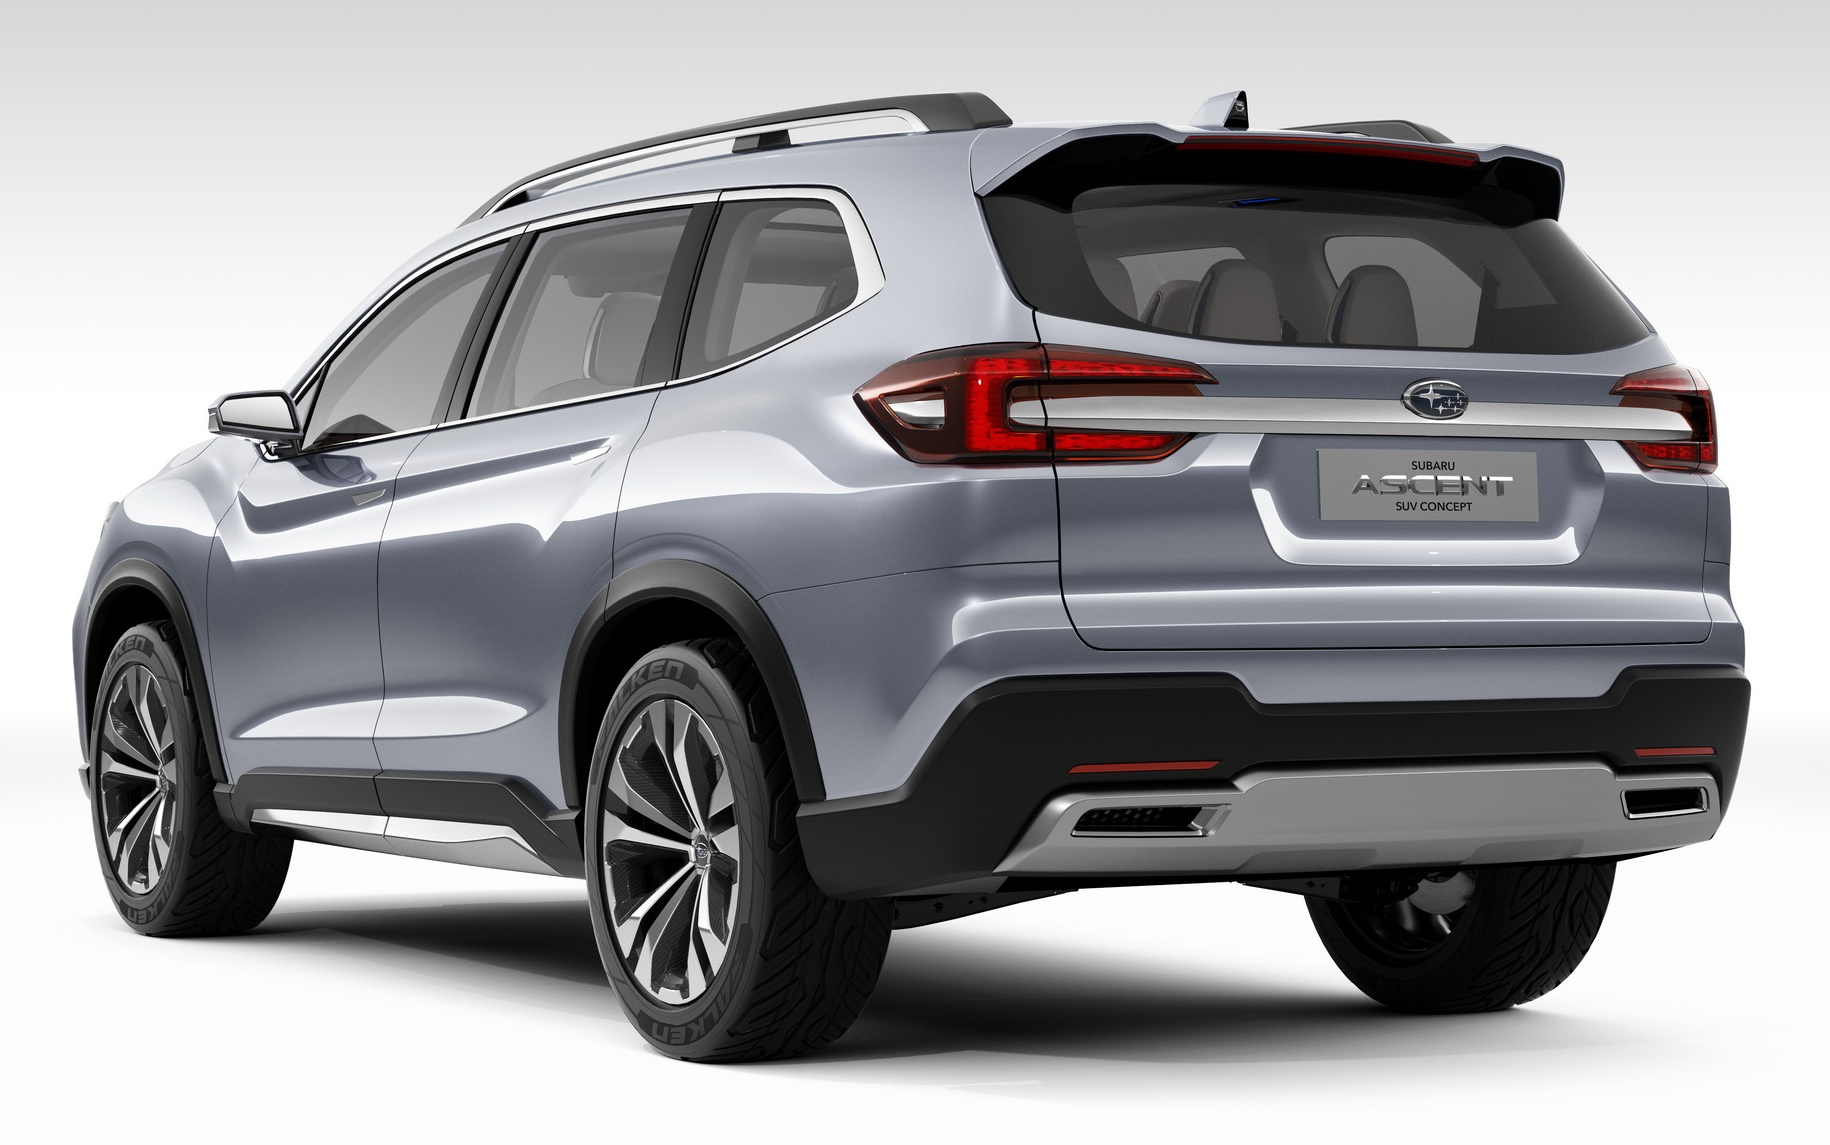 Subaru Suv 2017 >> Subaru Ascent Concept previews new three-row SUV Paul Tan - Image 644590